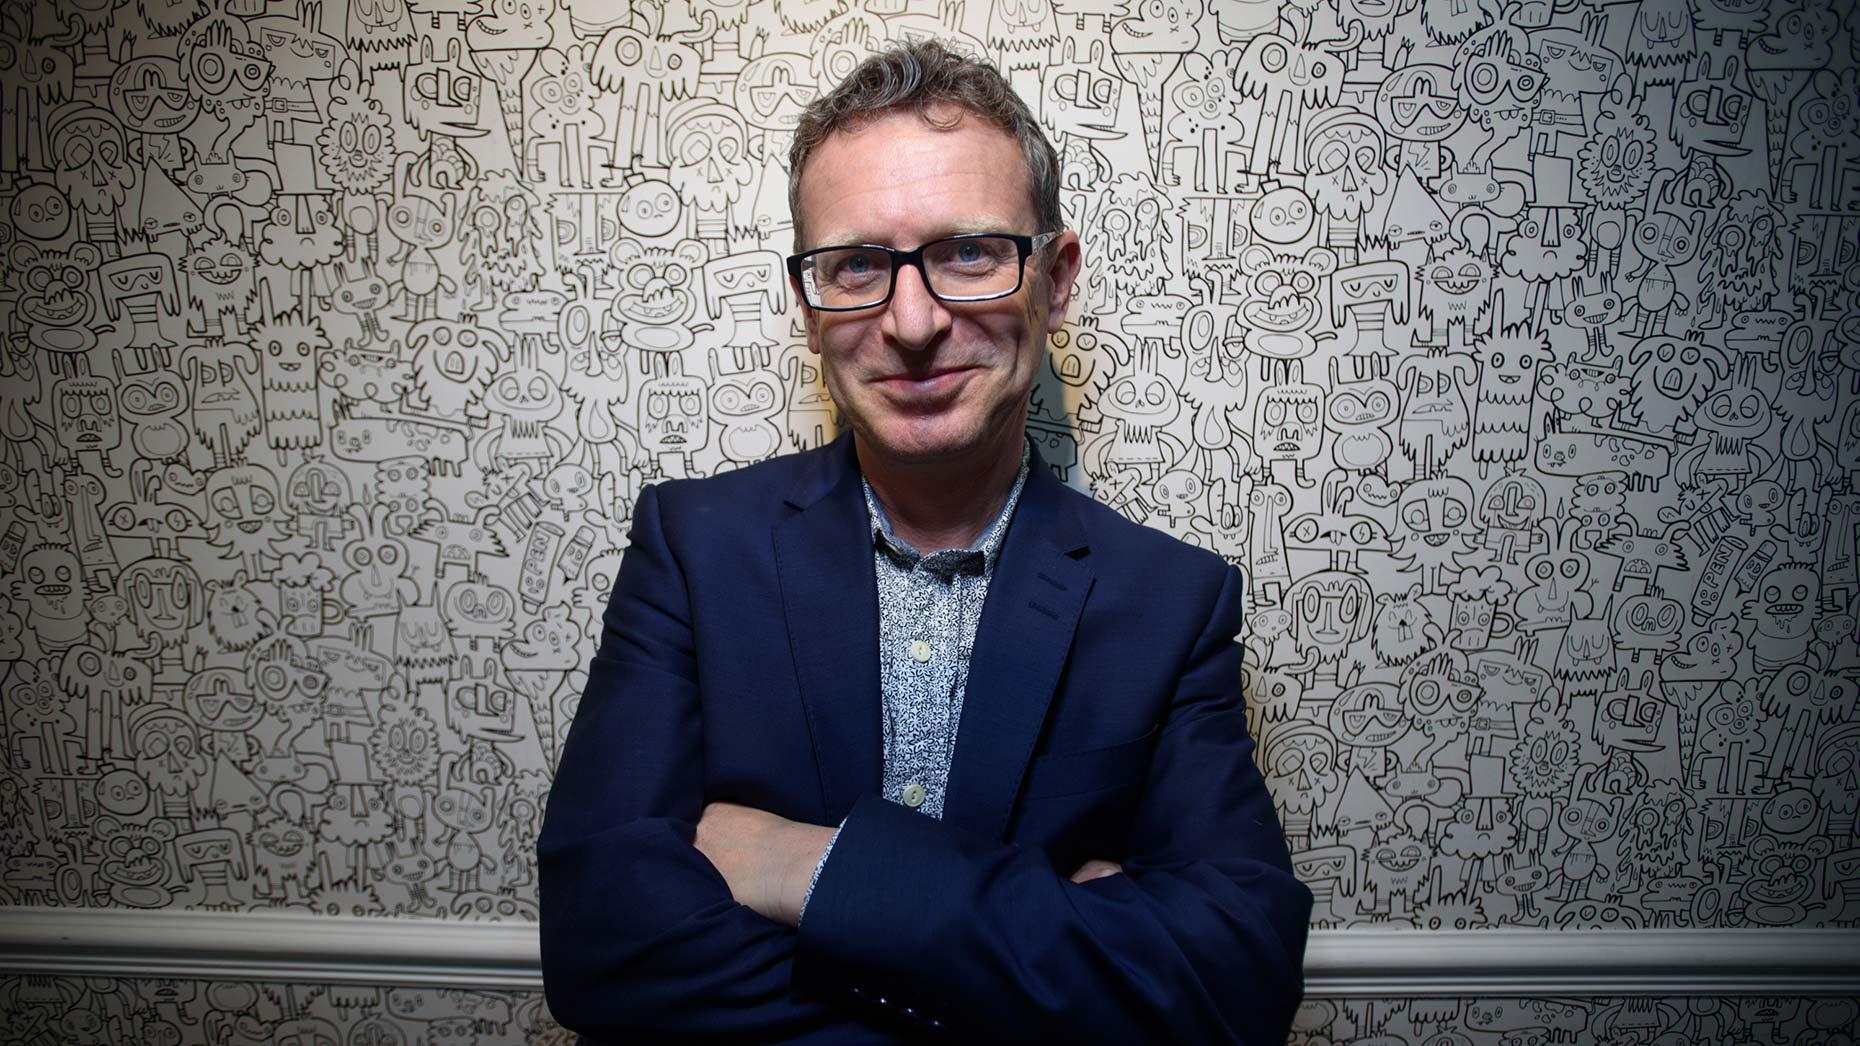 Simon Shaw, Managing Director for Optima. Photo: Steve Smailes